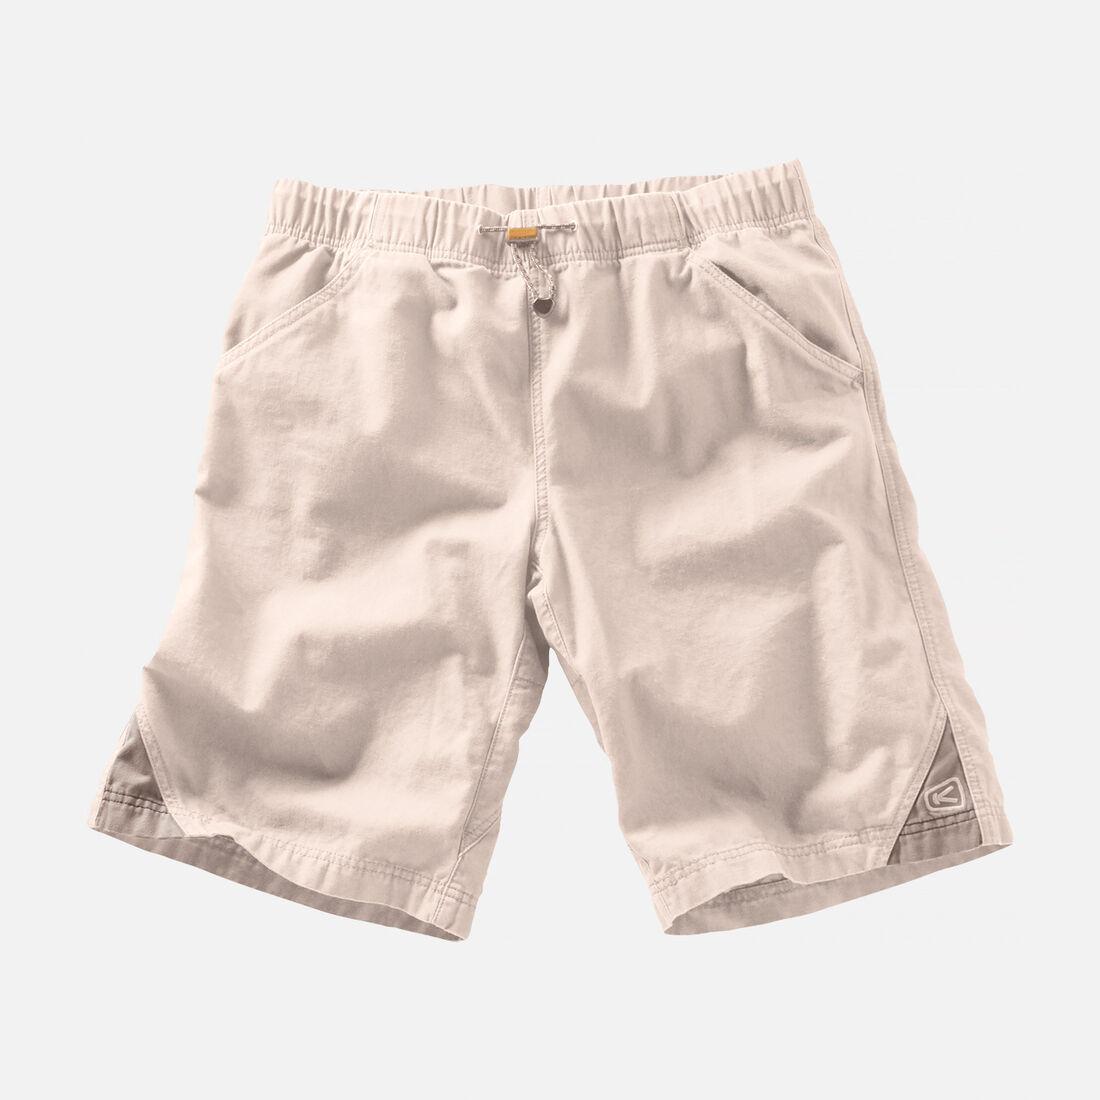 Men's Slacker Short in Stone/Khaki - large view.